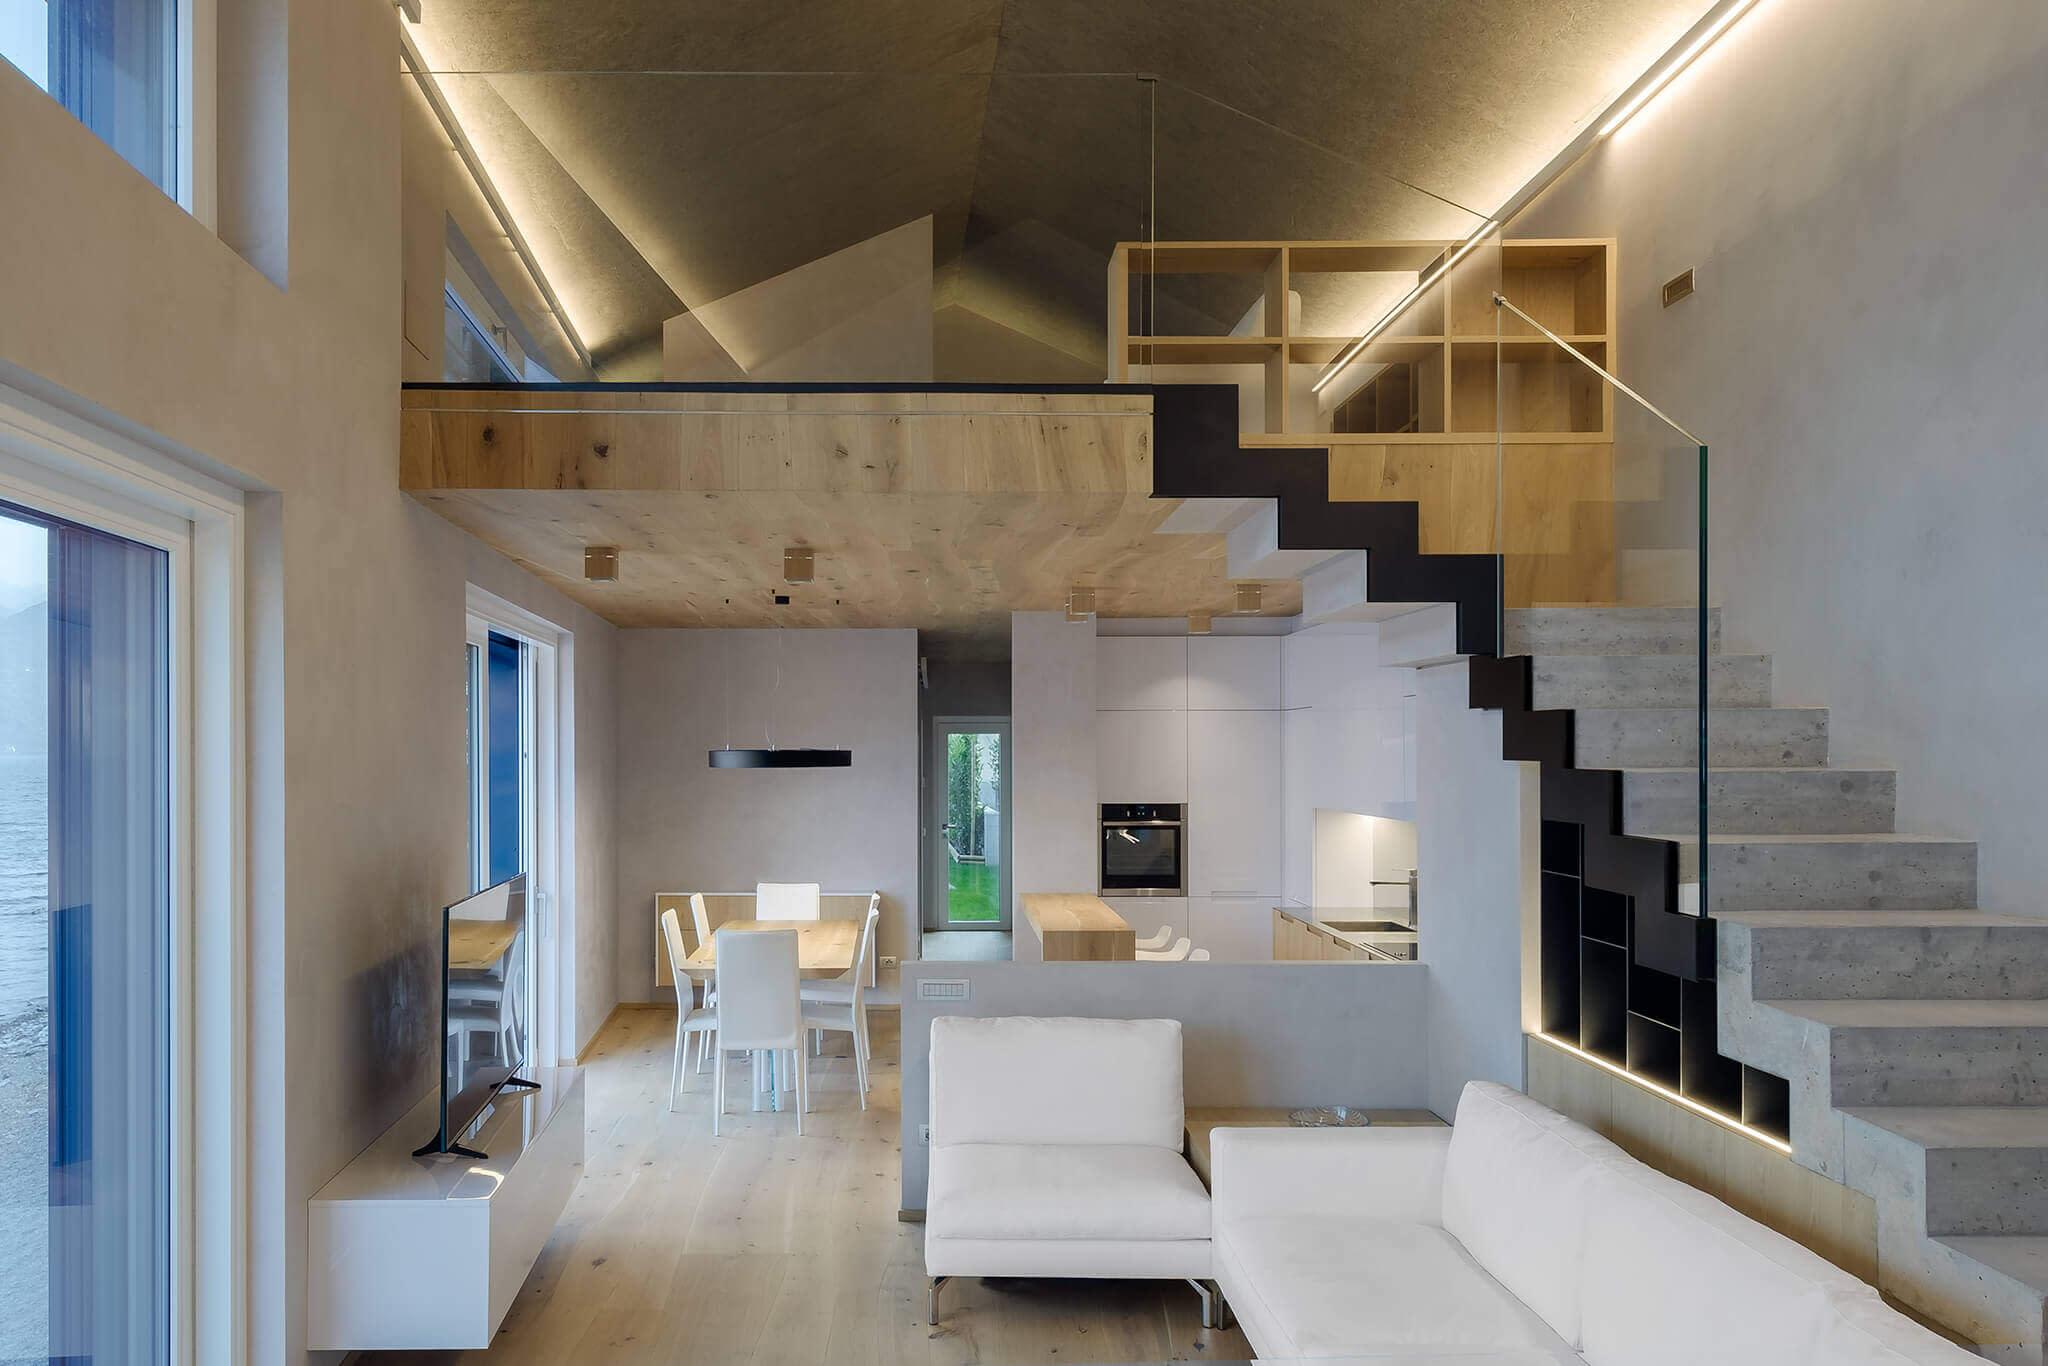 Fotografie Abitazione a Sansiro, Architetto Francesco Venzi